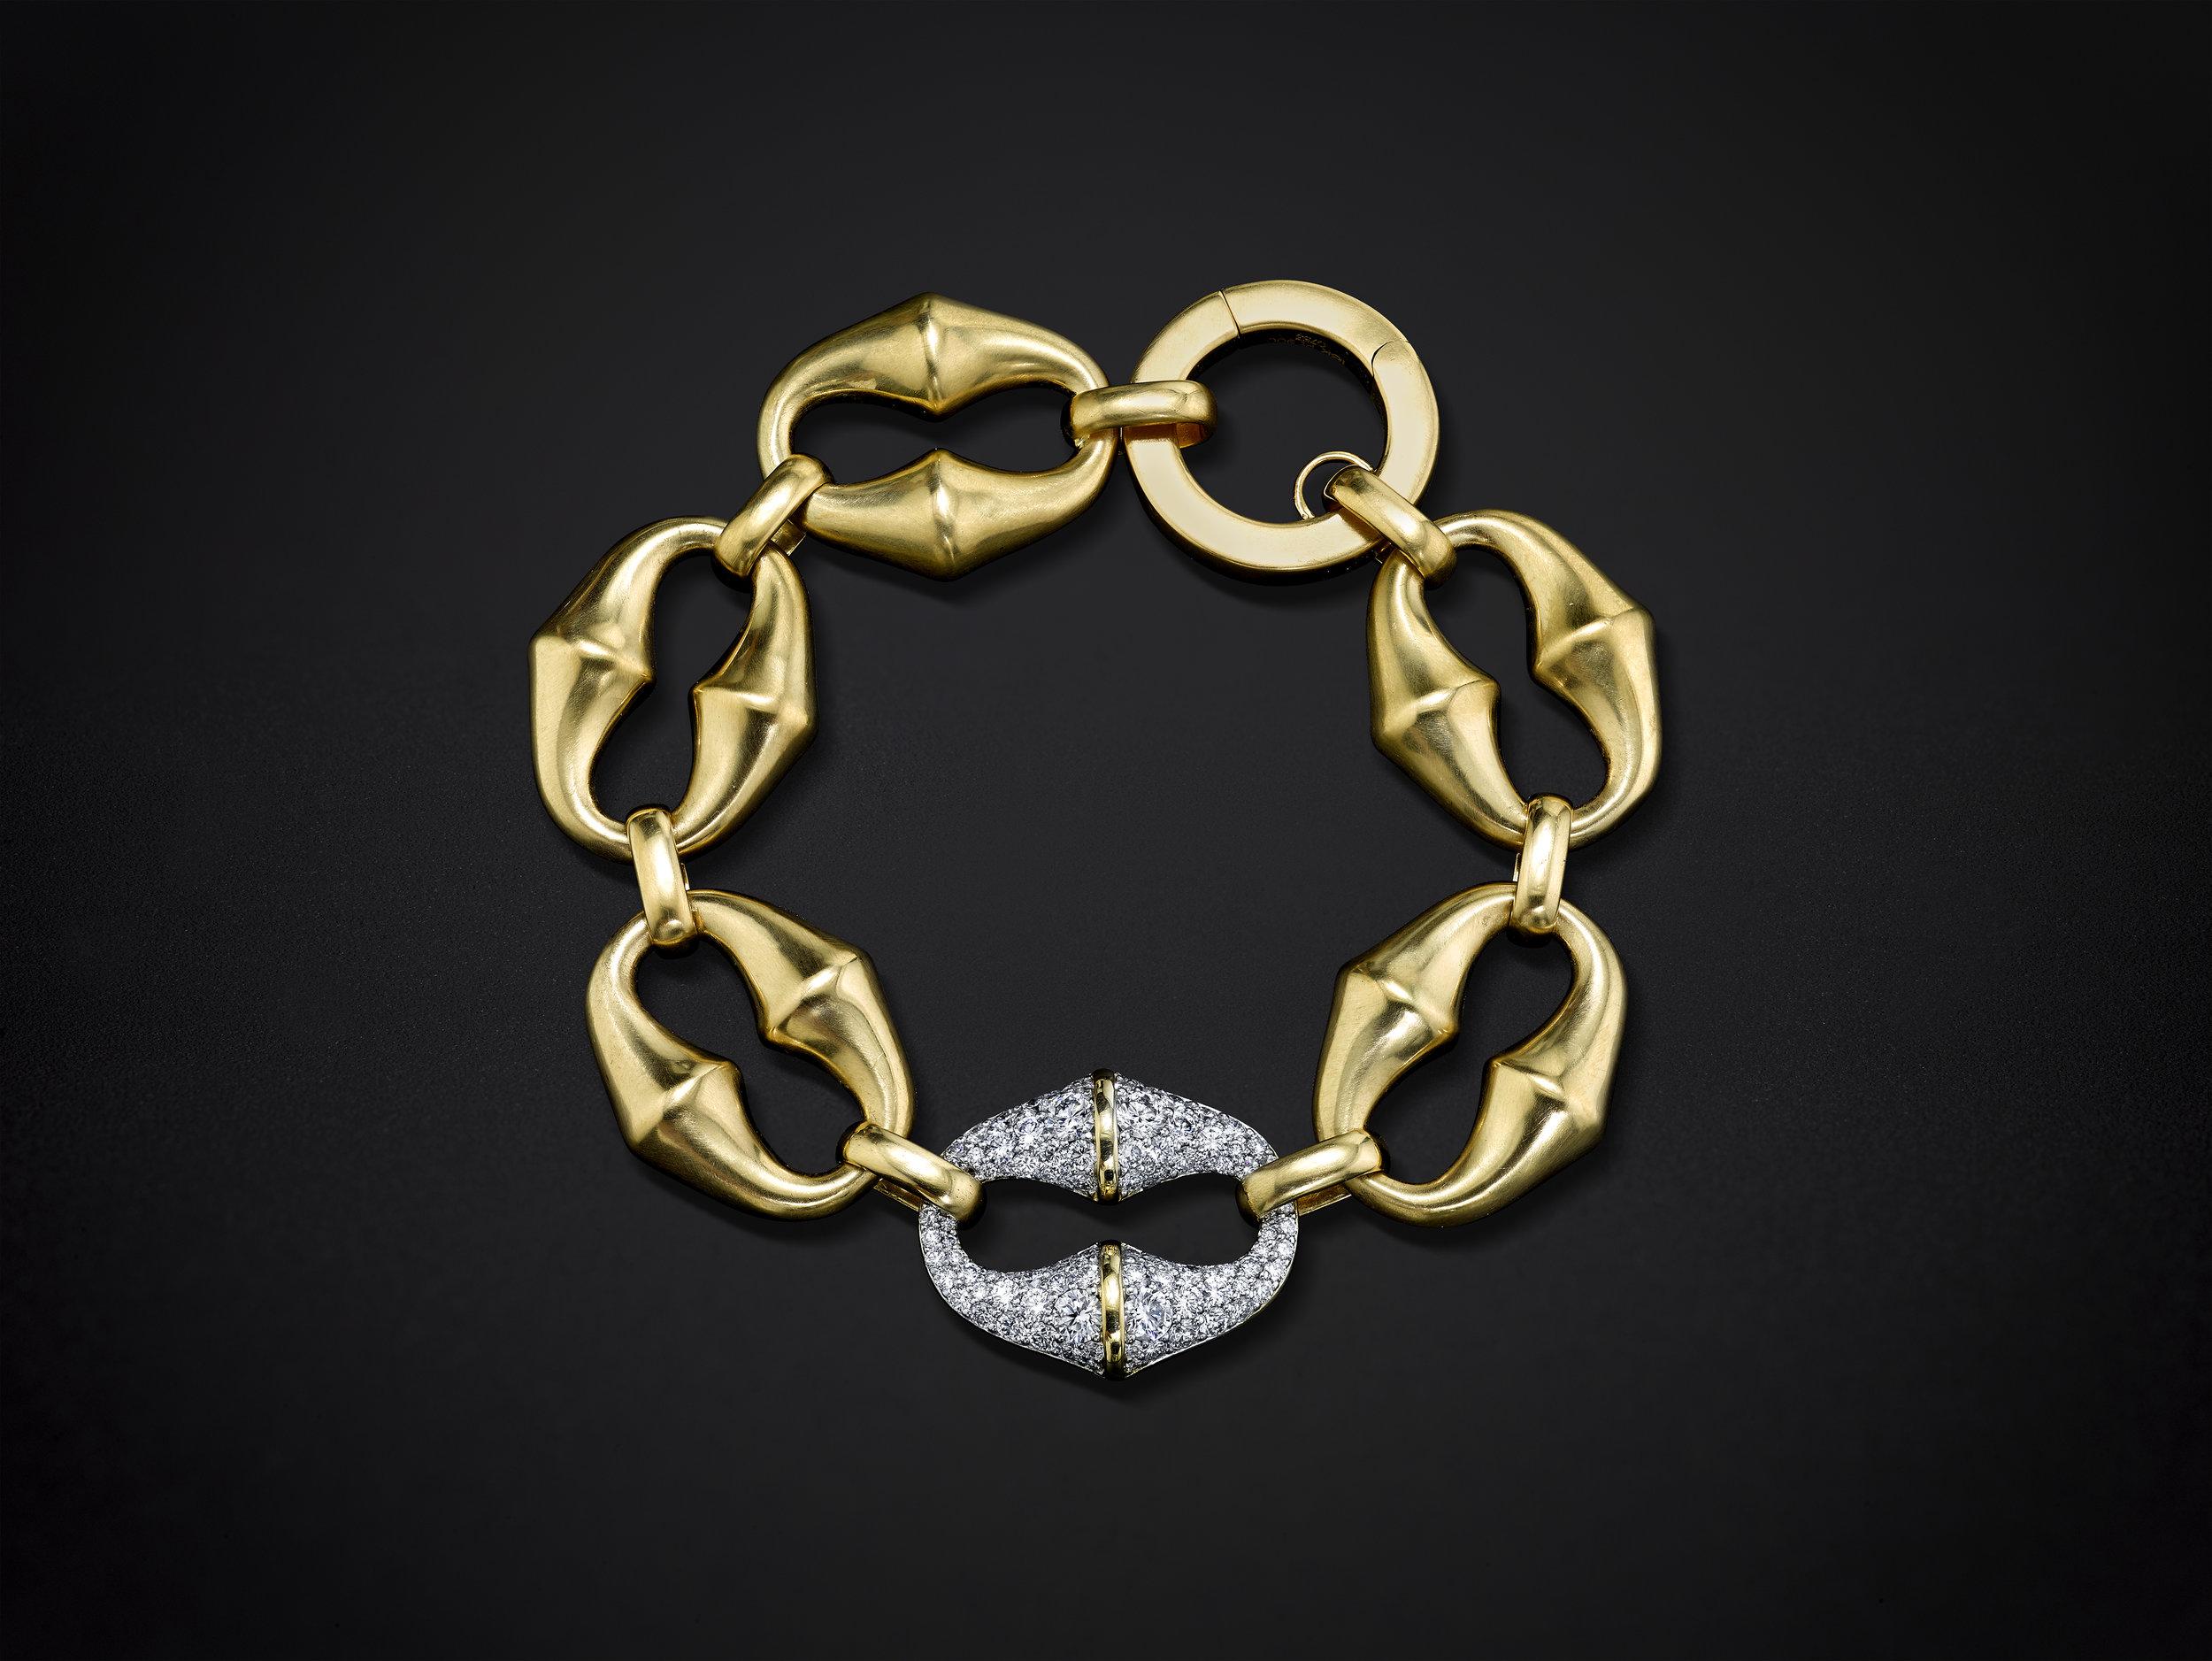 VRAM x Canadamark Chrona Bracelet